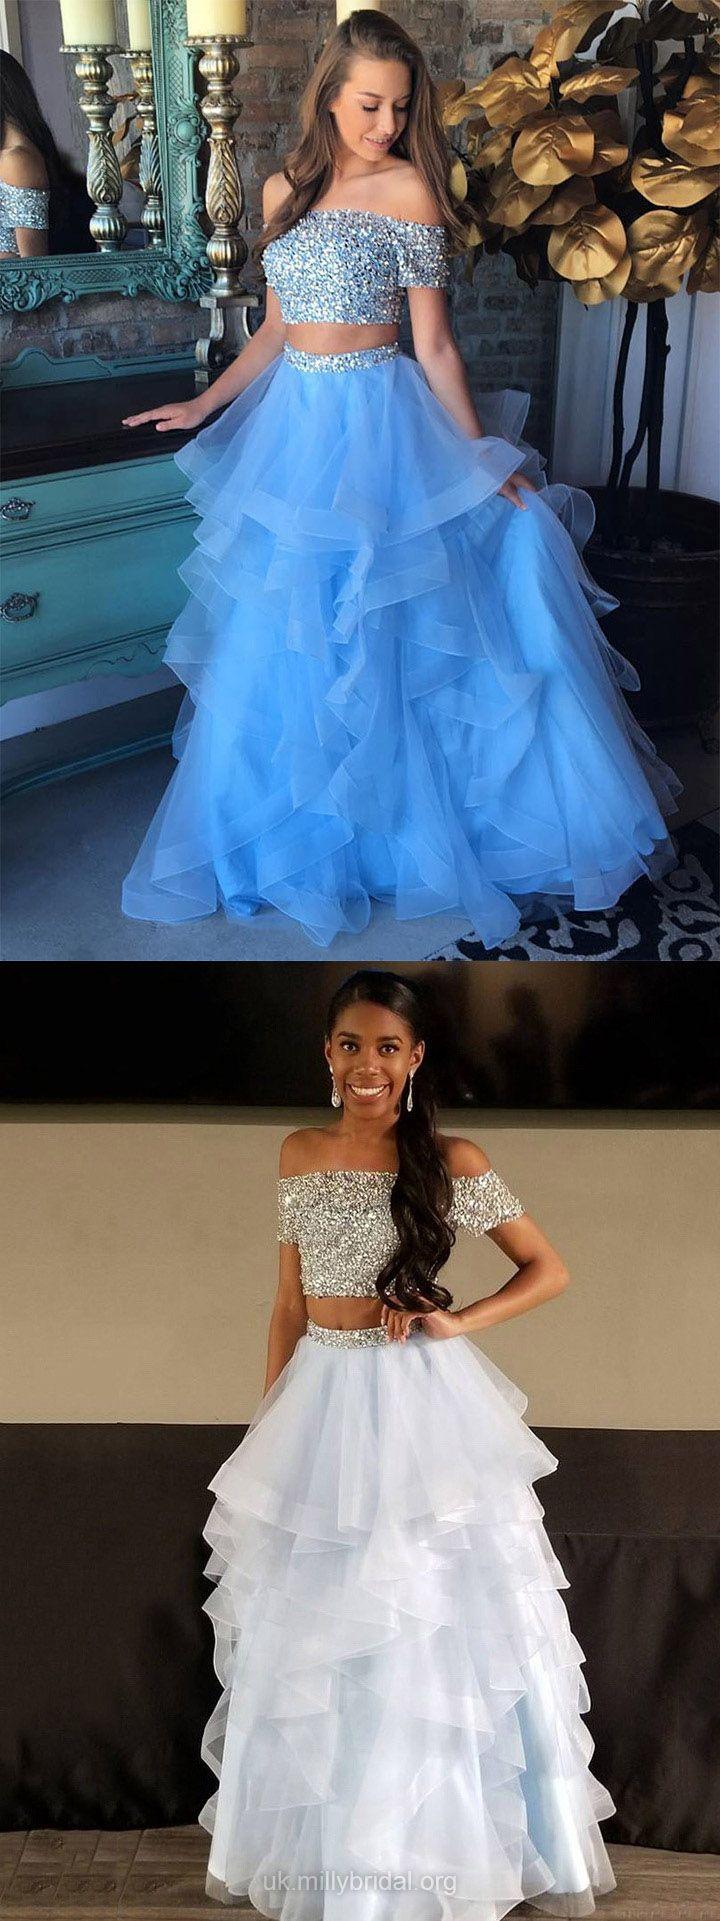 Two piece prom dresses long prom dresses blue prom dresses